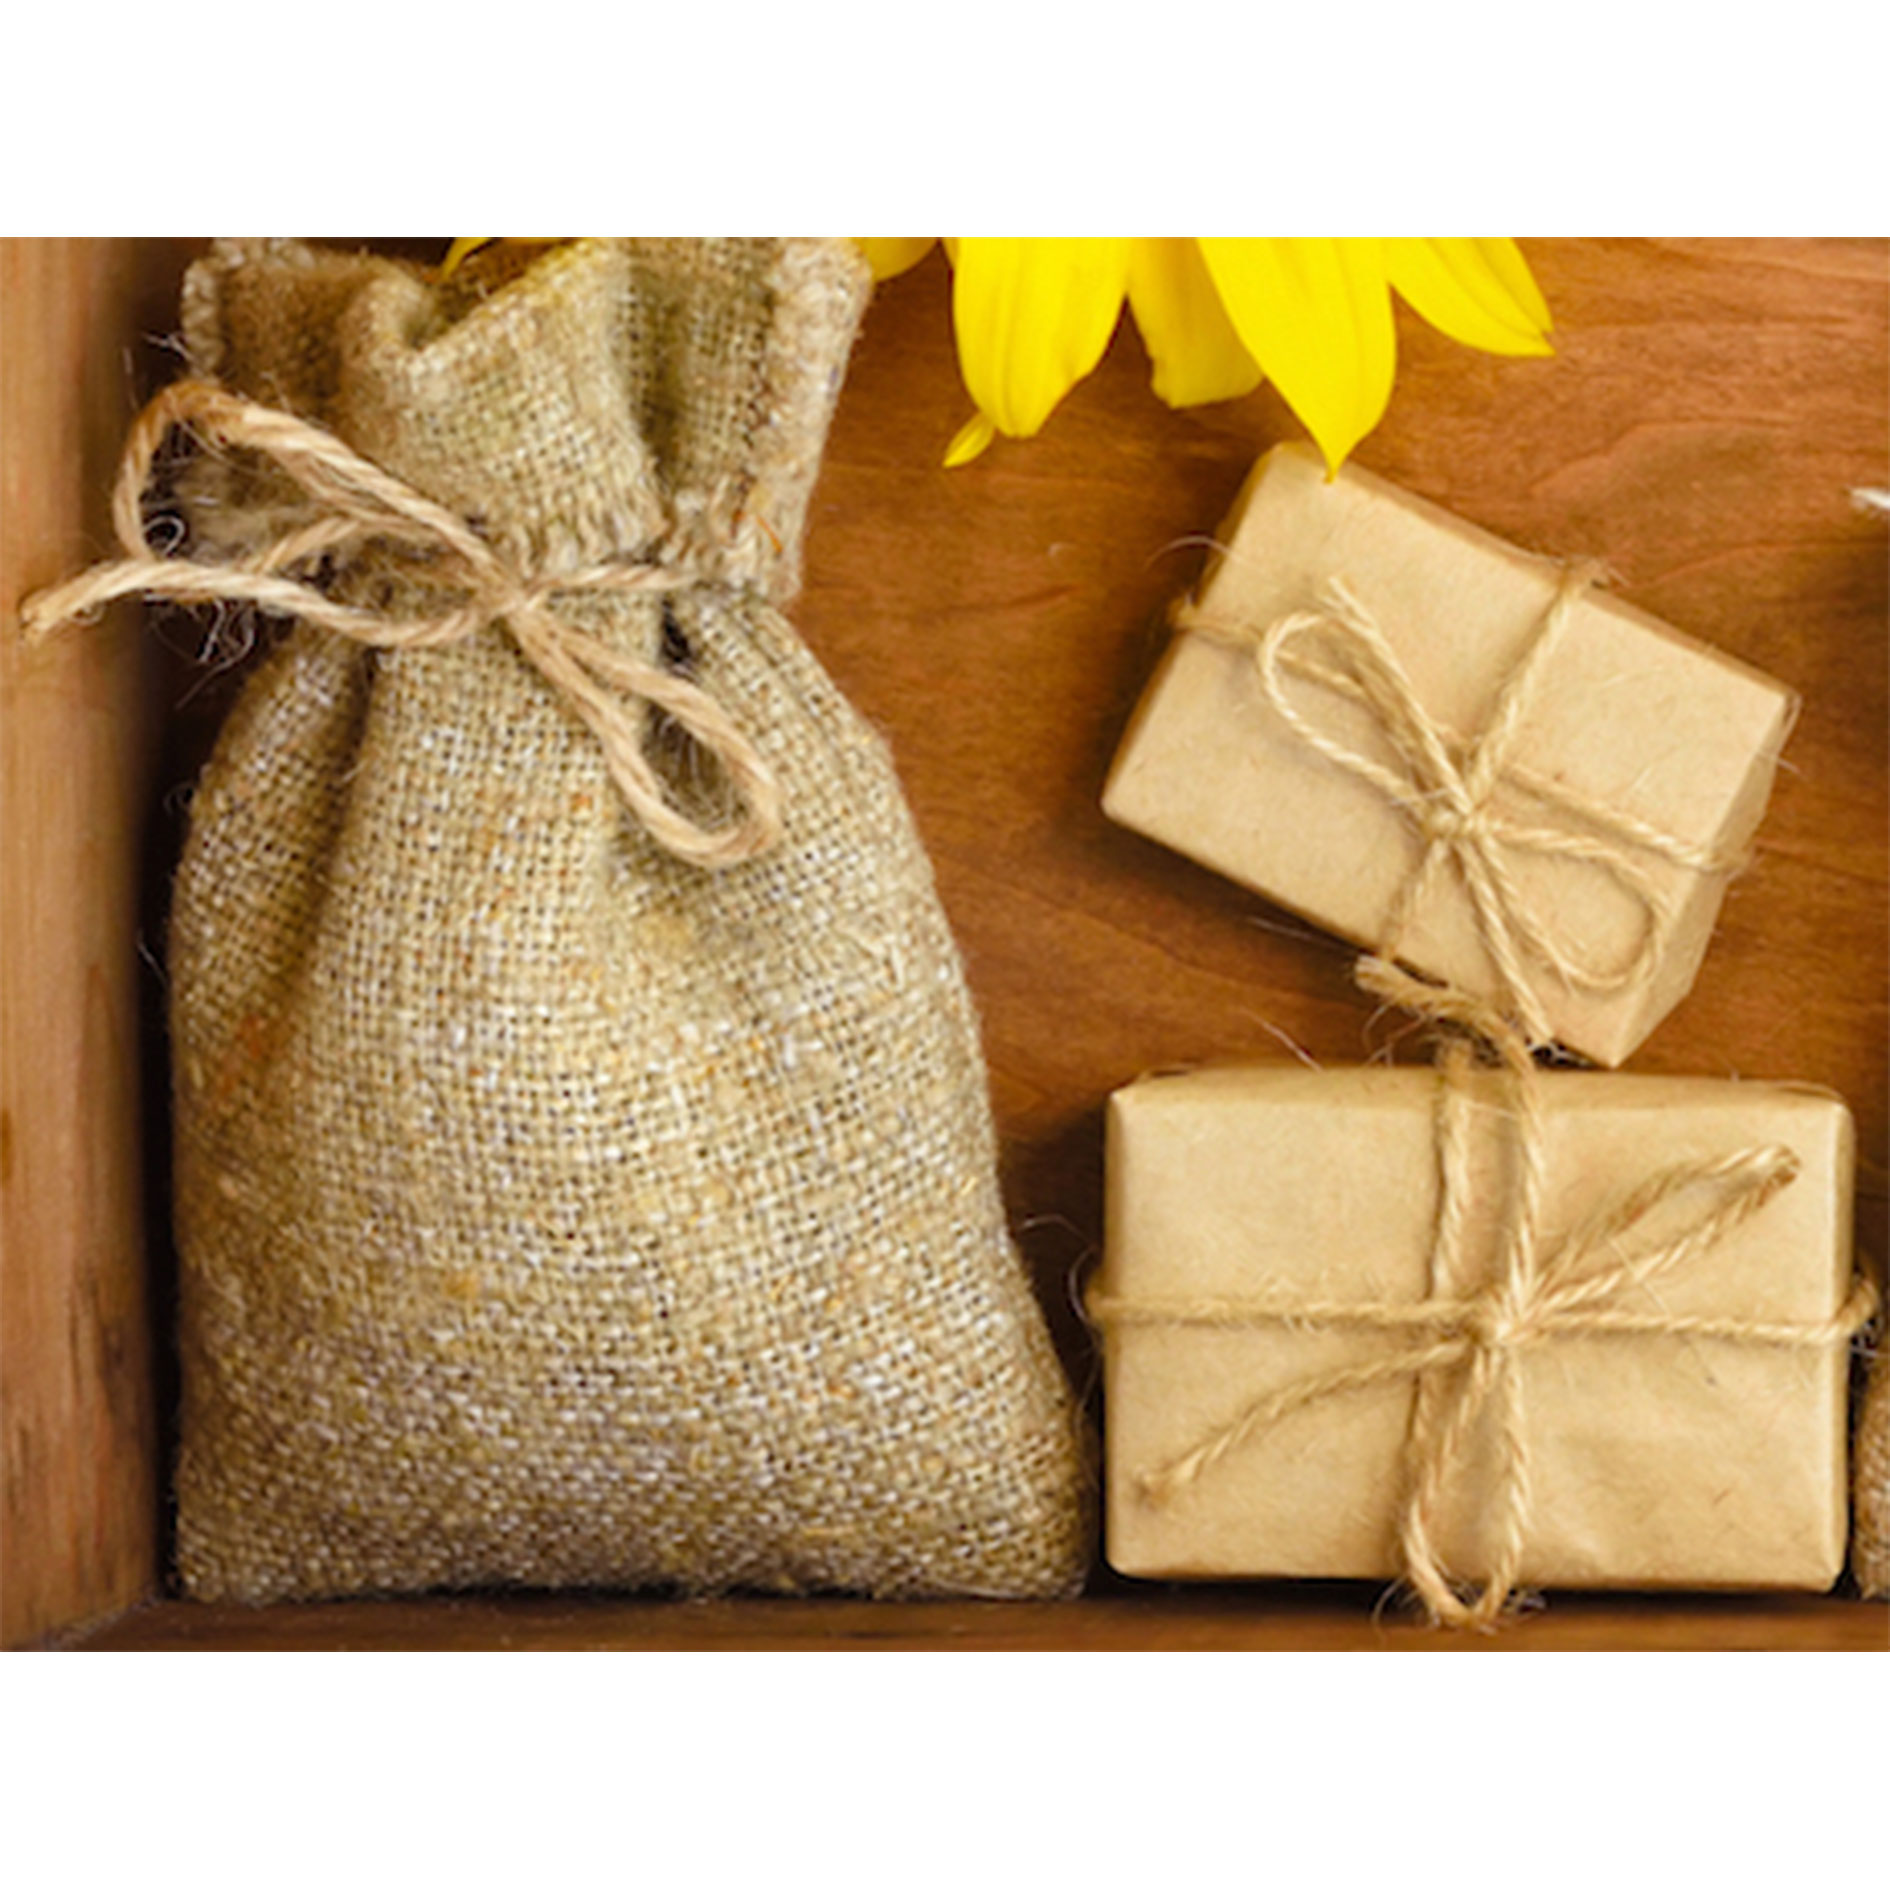 bolsita-de-tela-de-yute-y-dos-paquetitos-envueltos-para-regalo